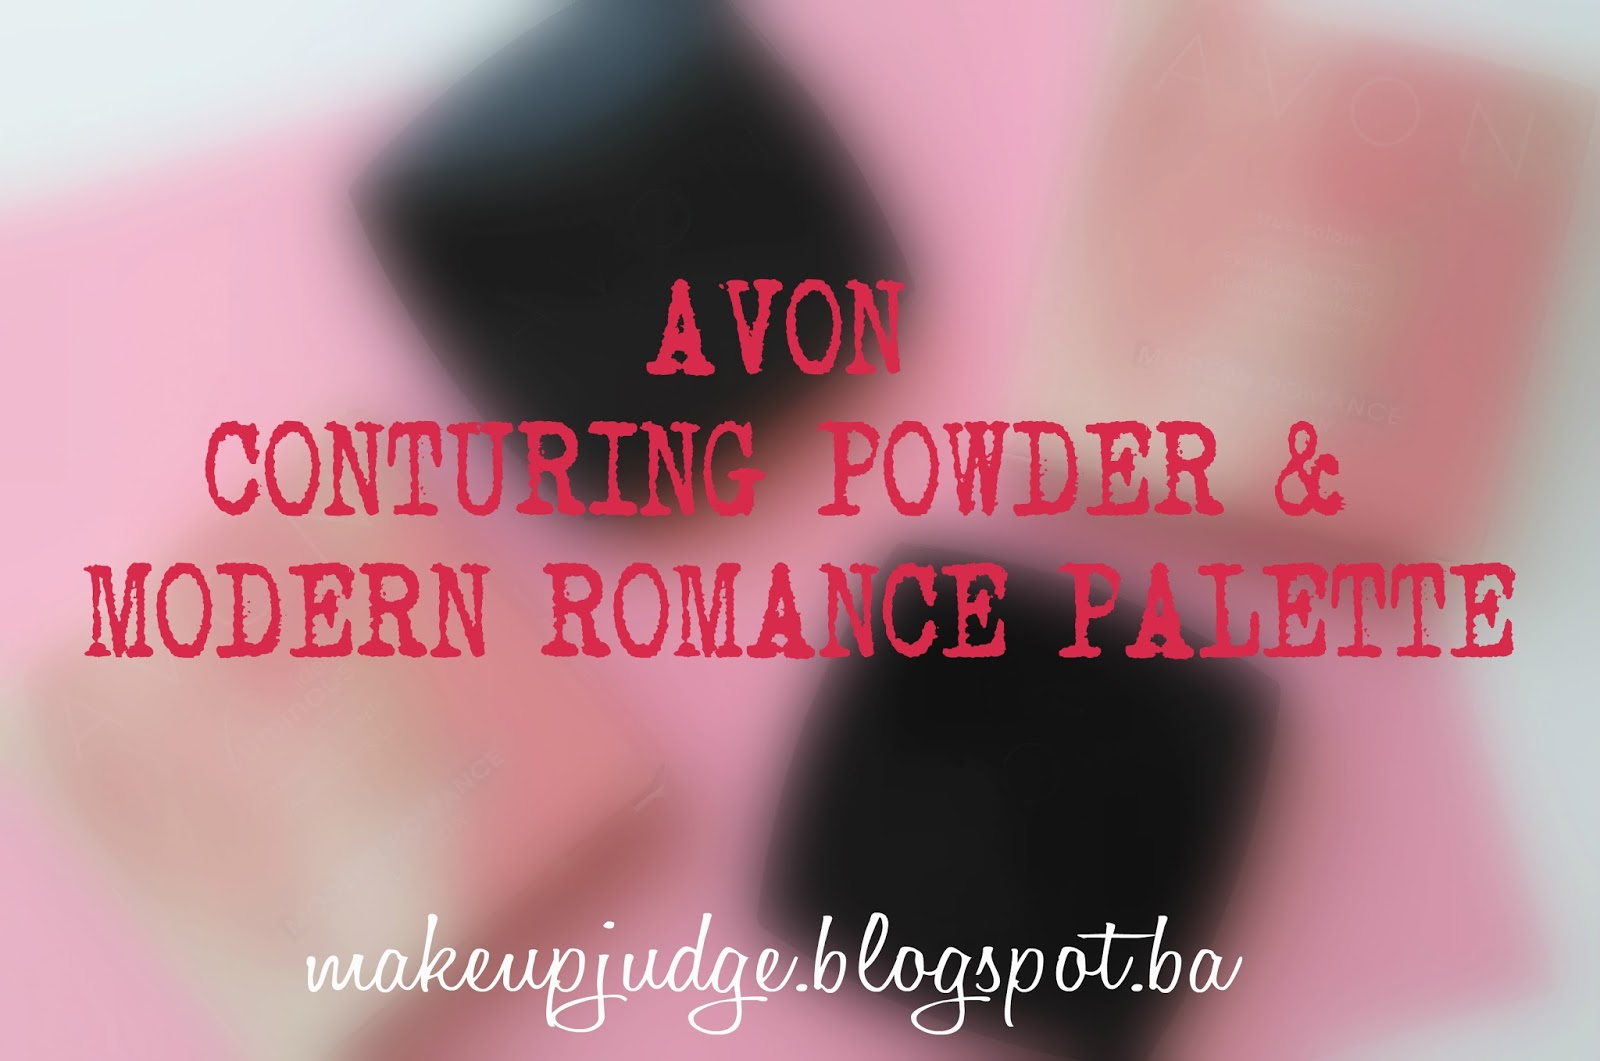 Avon dating